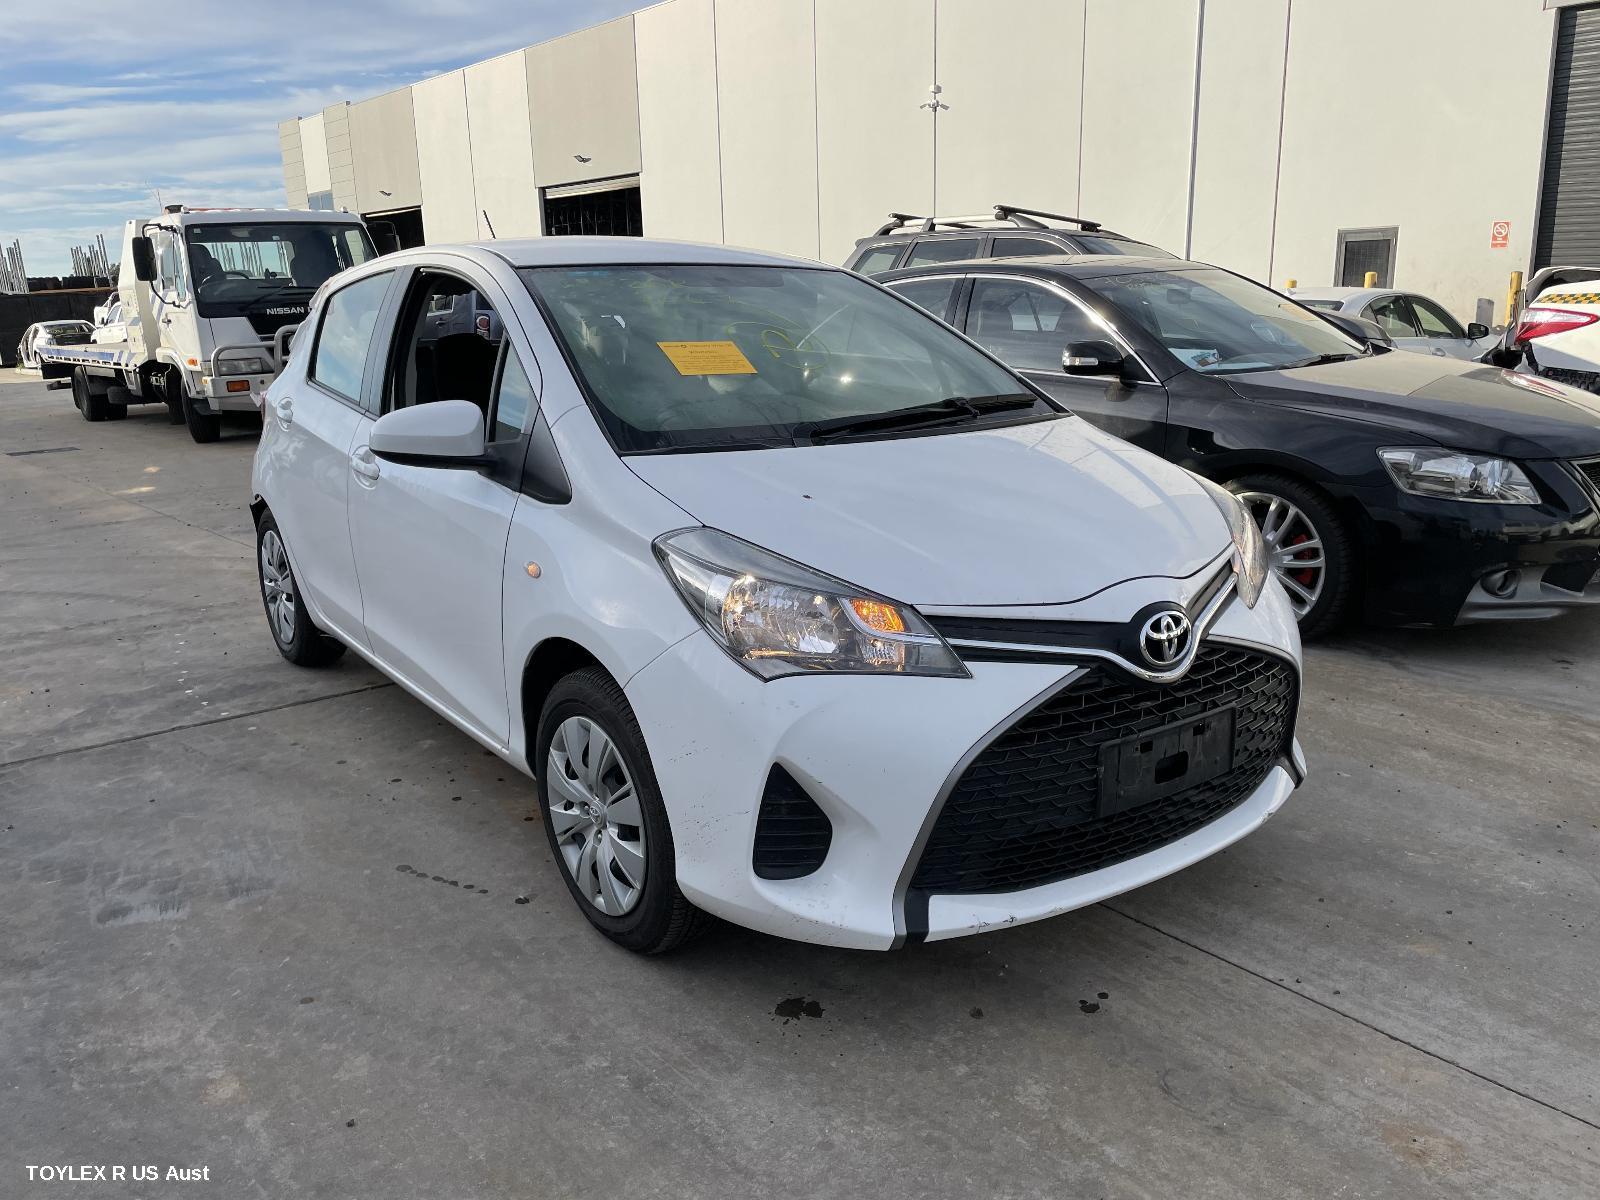 Toyota YARIS NCP130R 2NZ-FE 1.3L Engine Automatic FWD Transmission 07/14 - 12/19